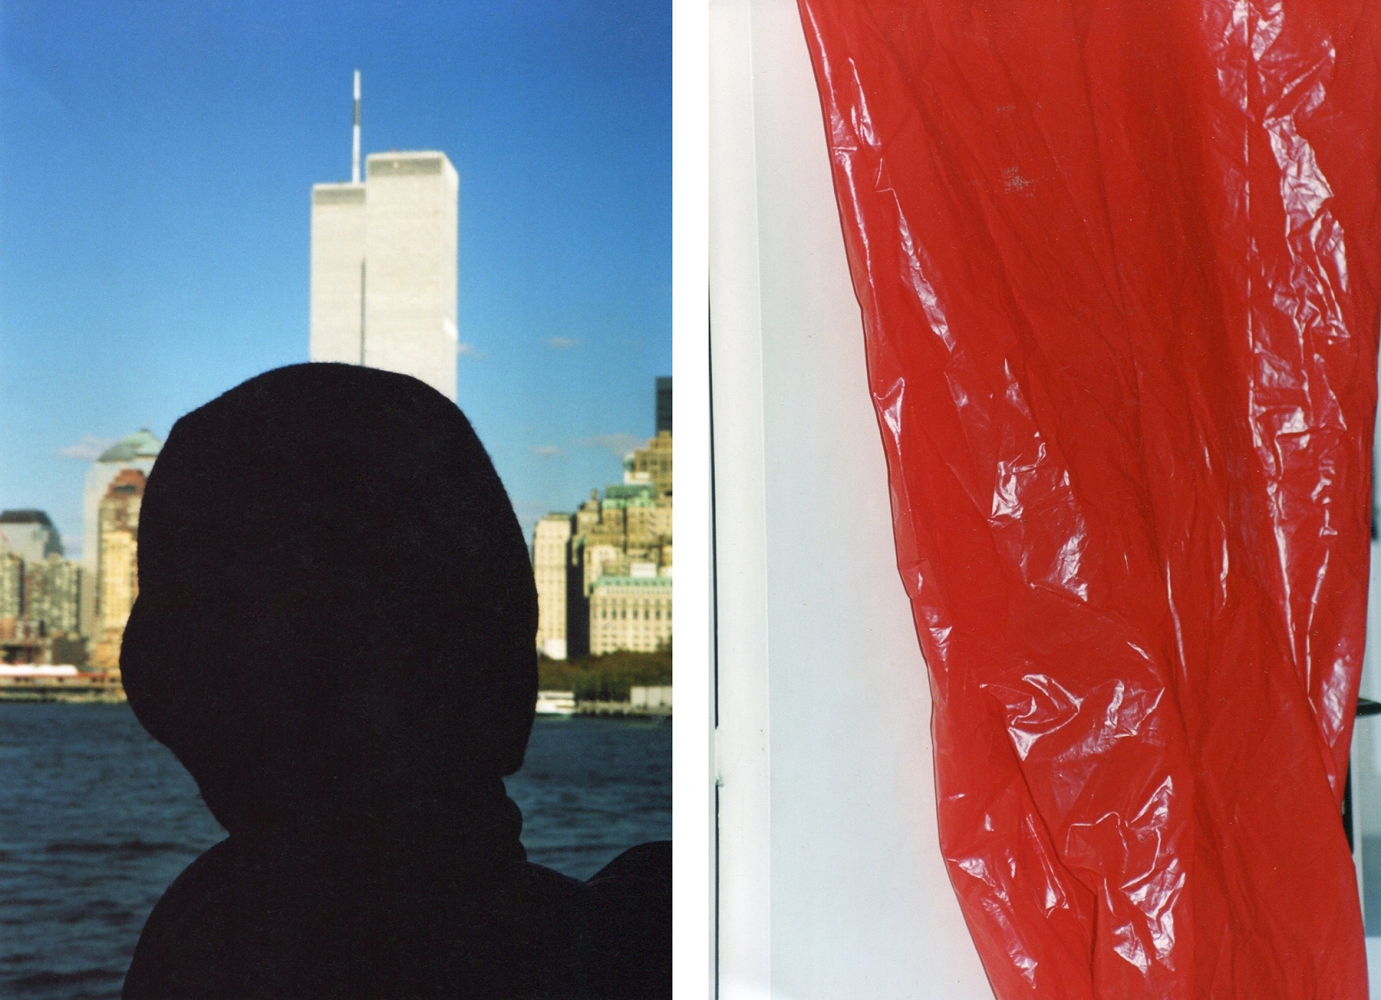 Mémoire infernale - 1998-2001